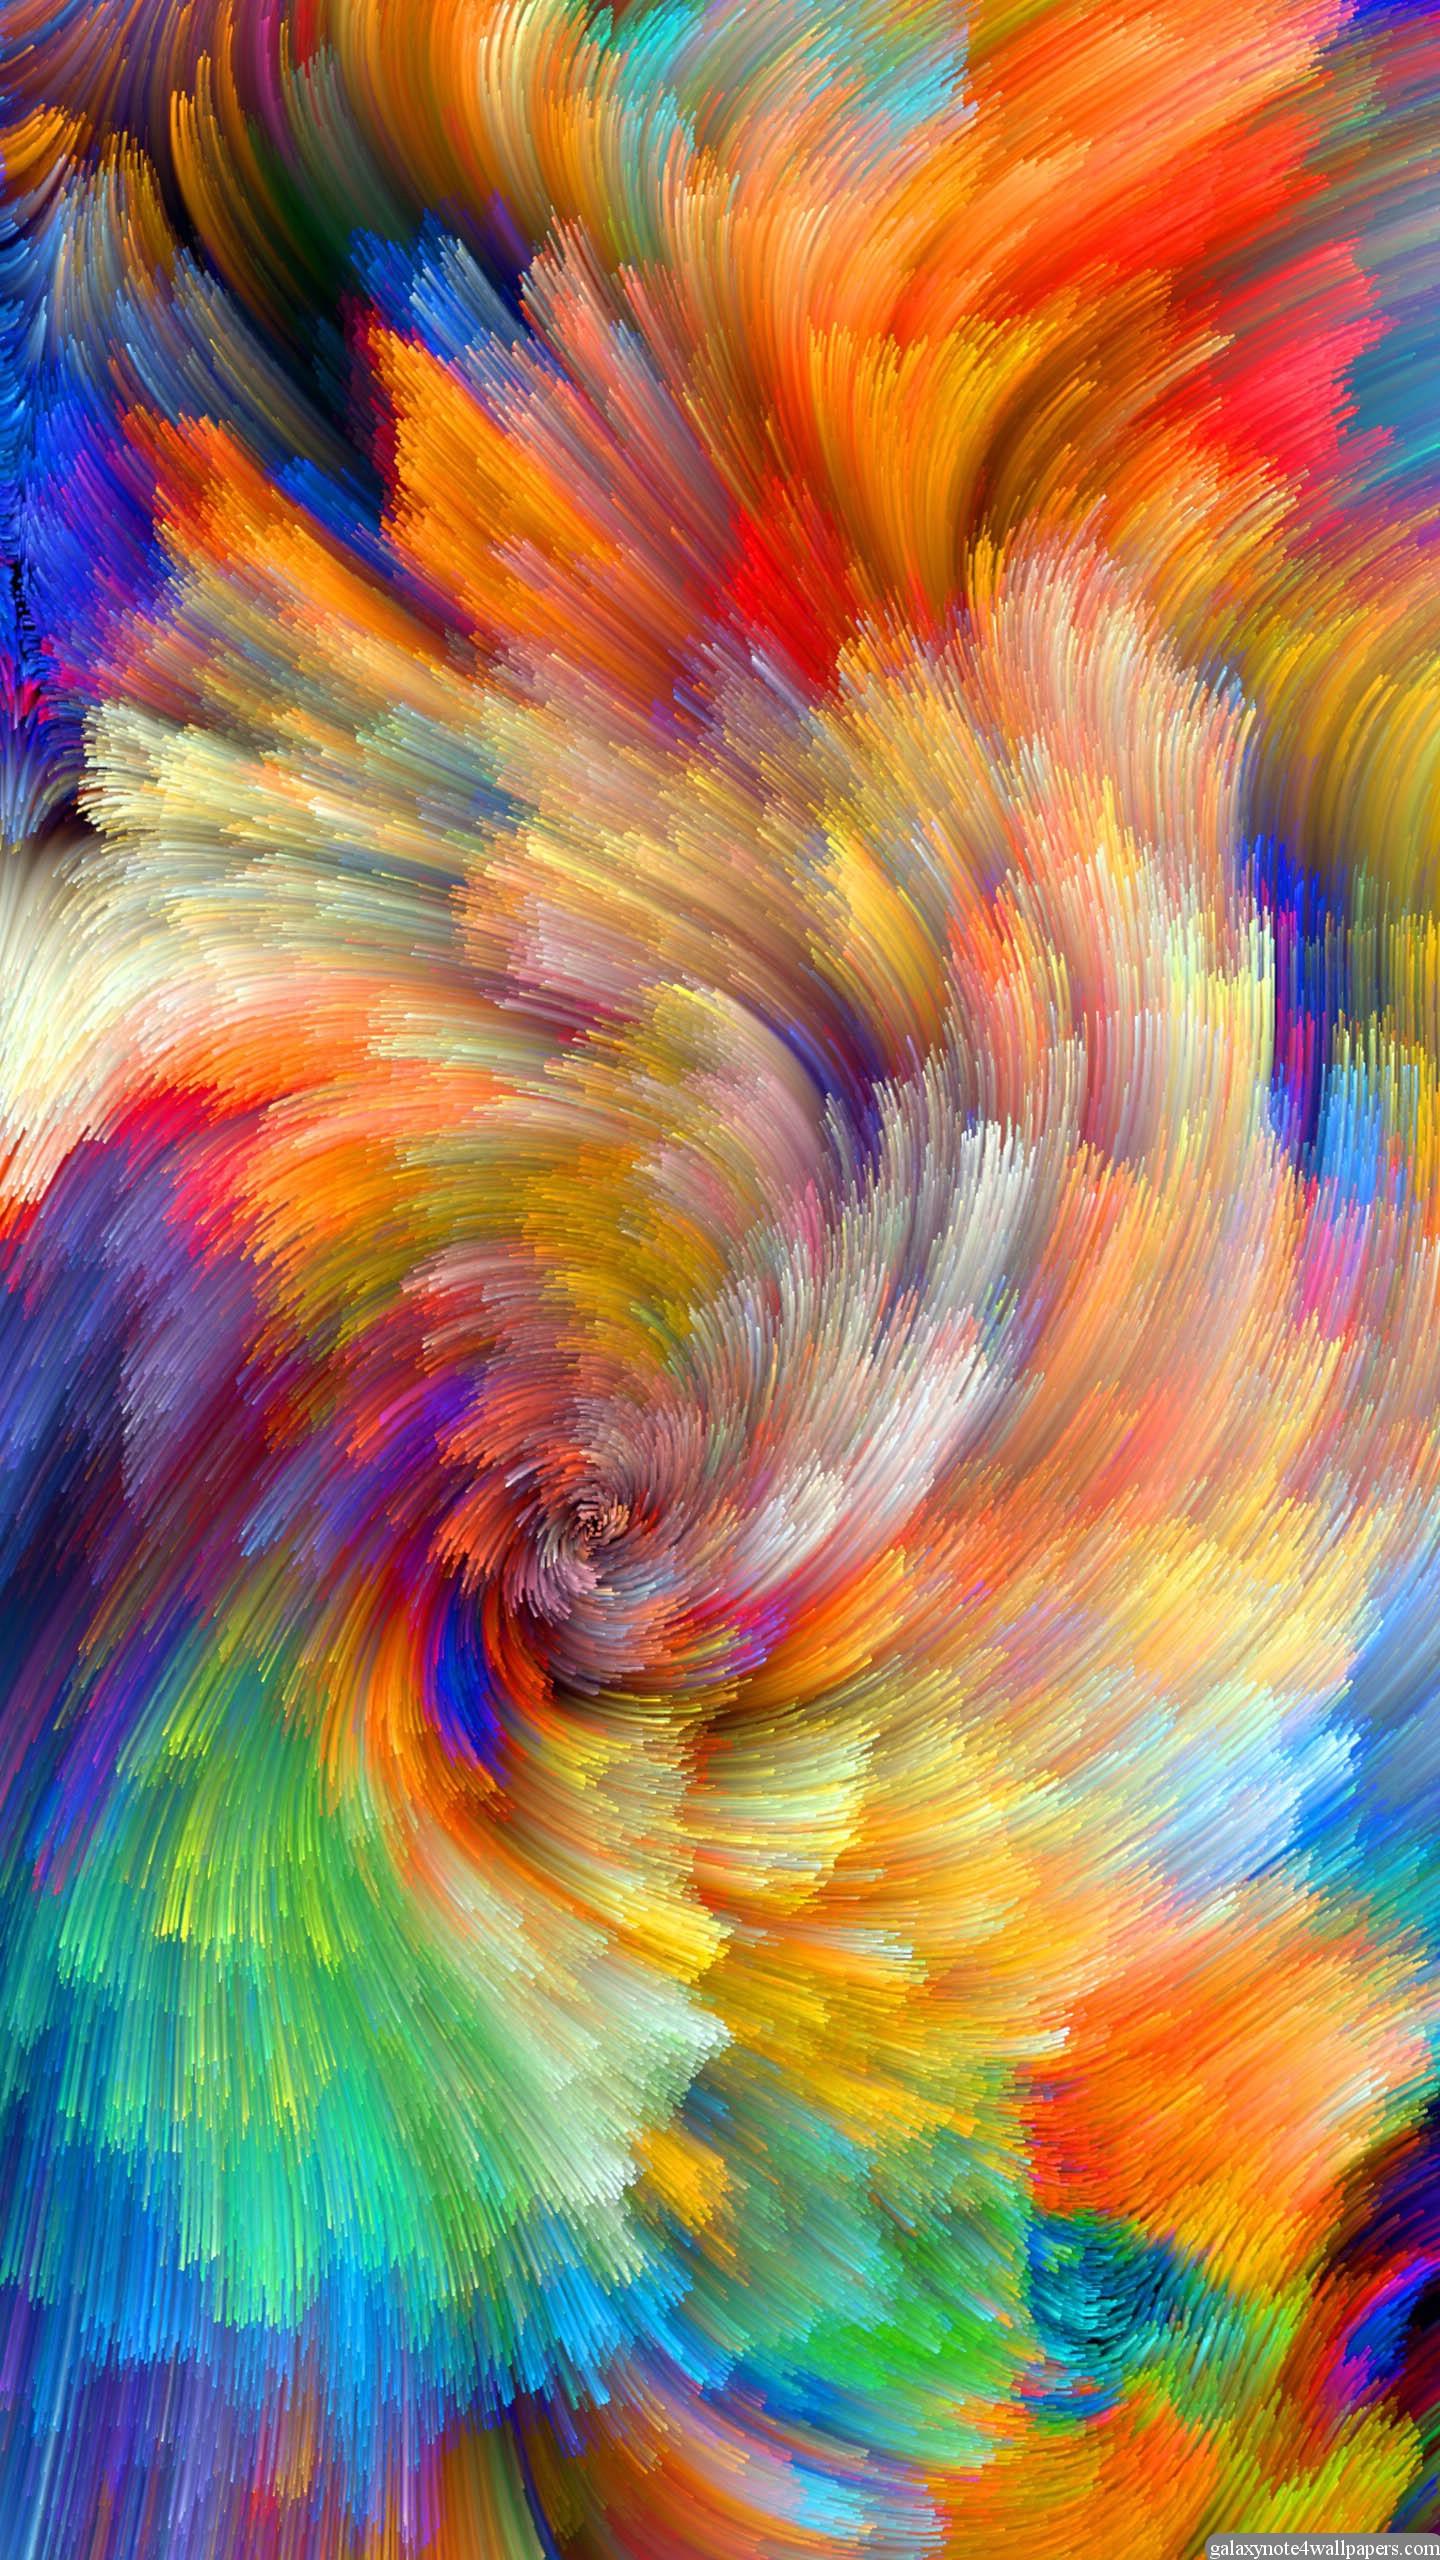 Samsung Galaxy S5 Wallpaper HD   Wallpapers Galaxy Note 4 Wallpaper 1440x2560